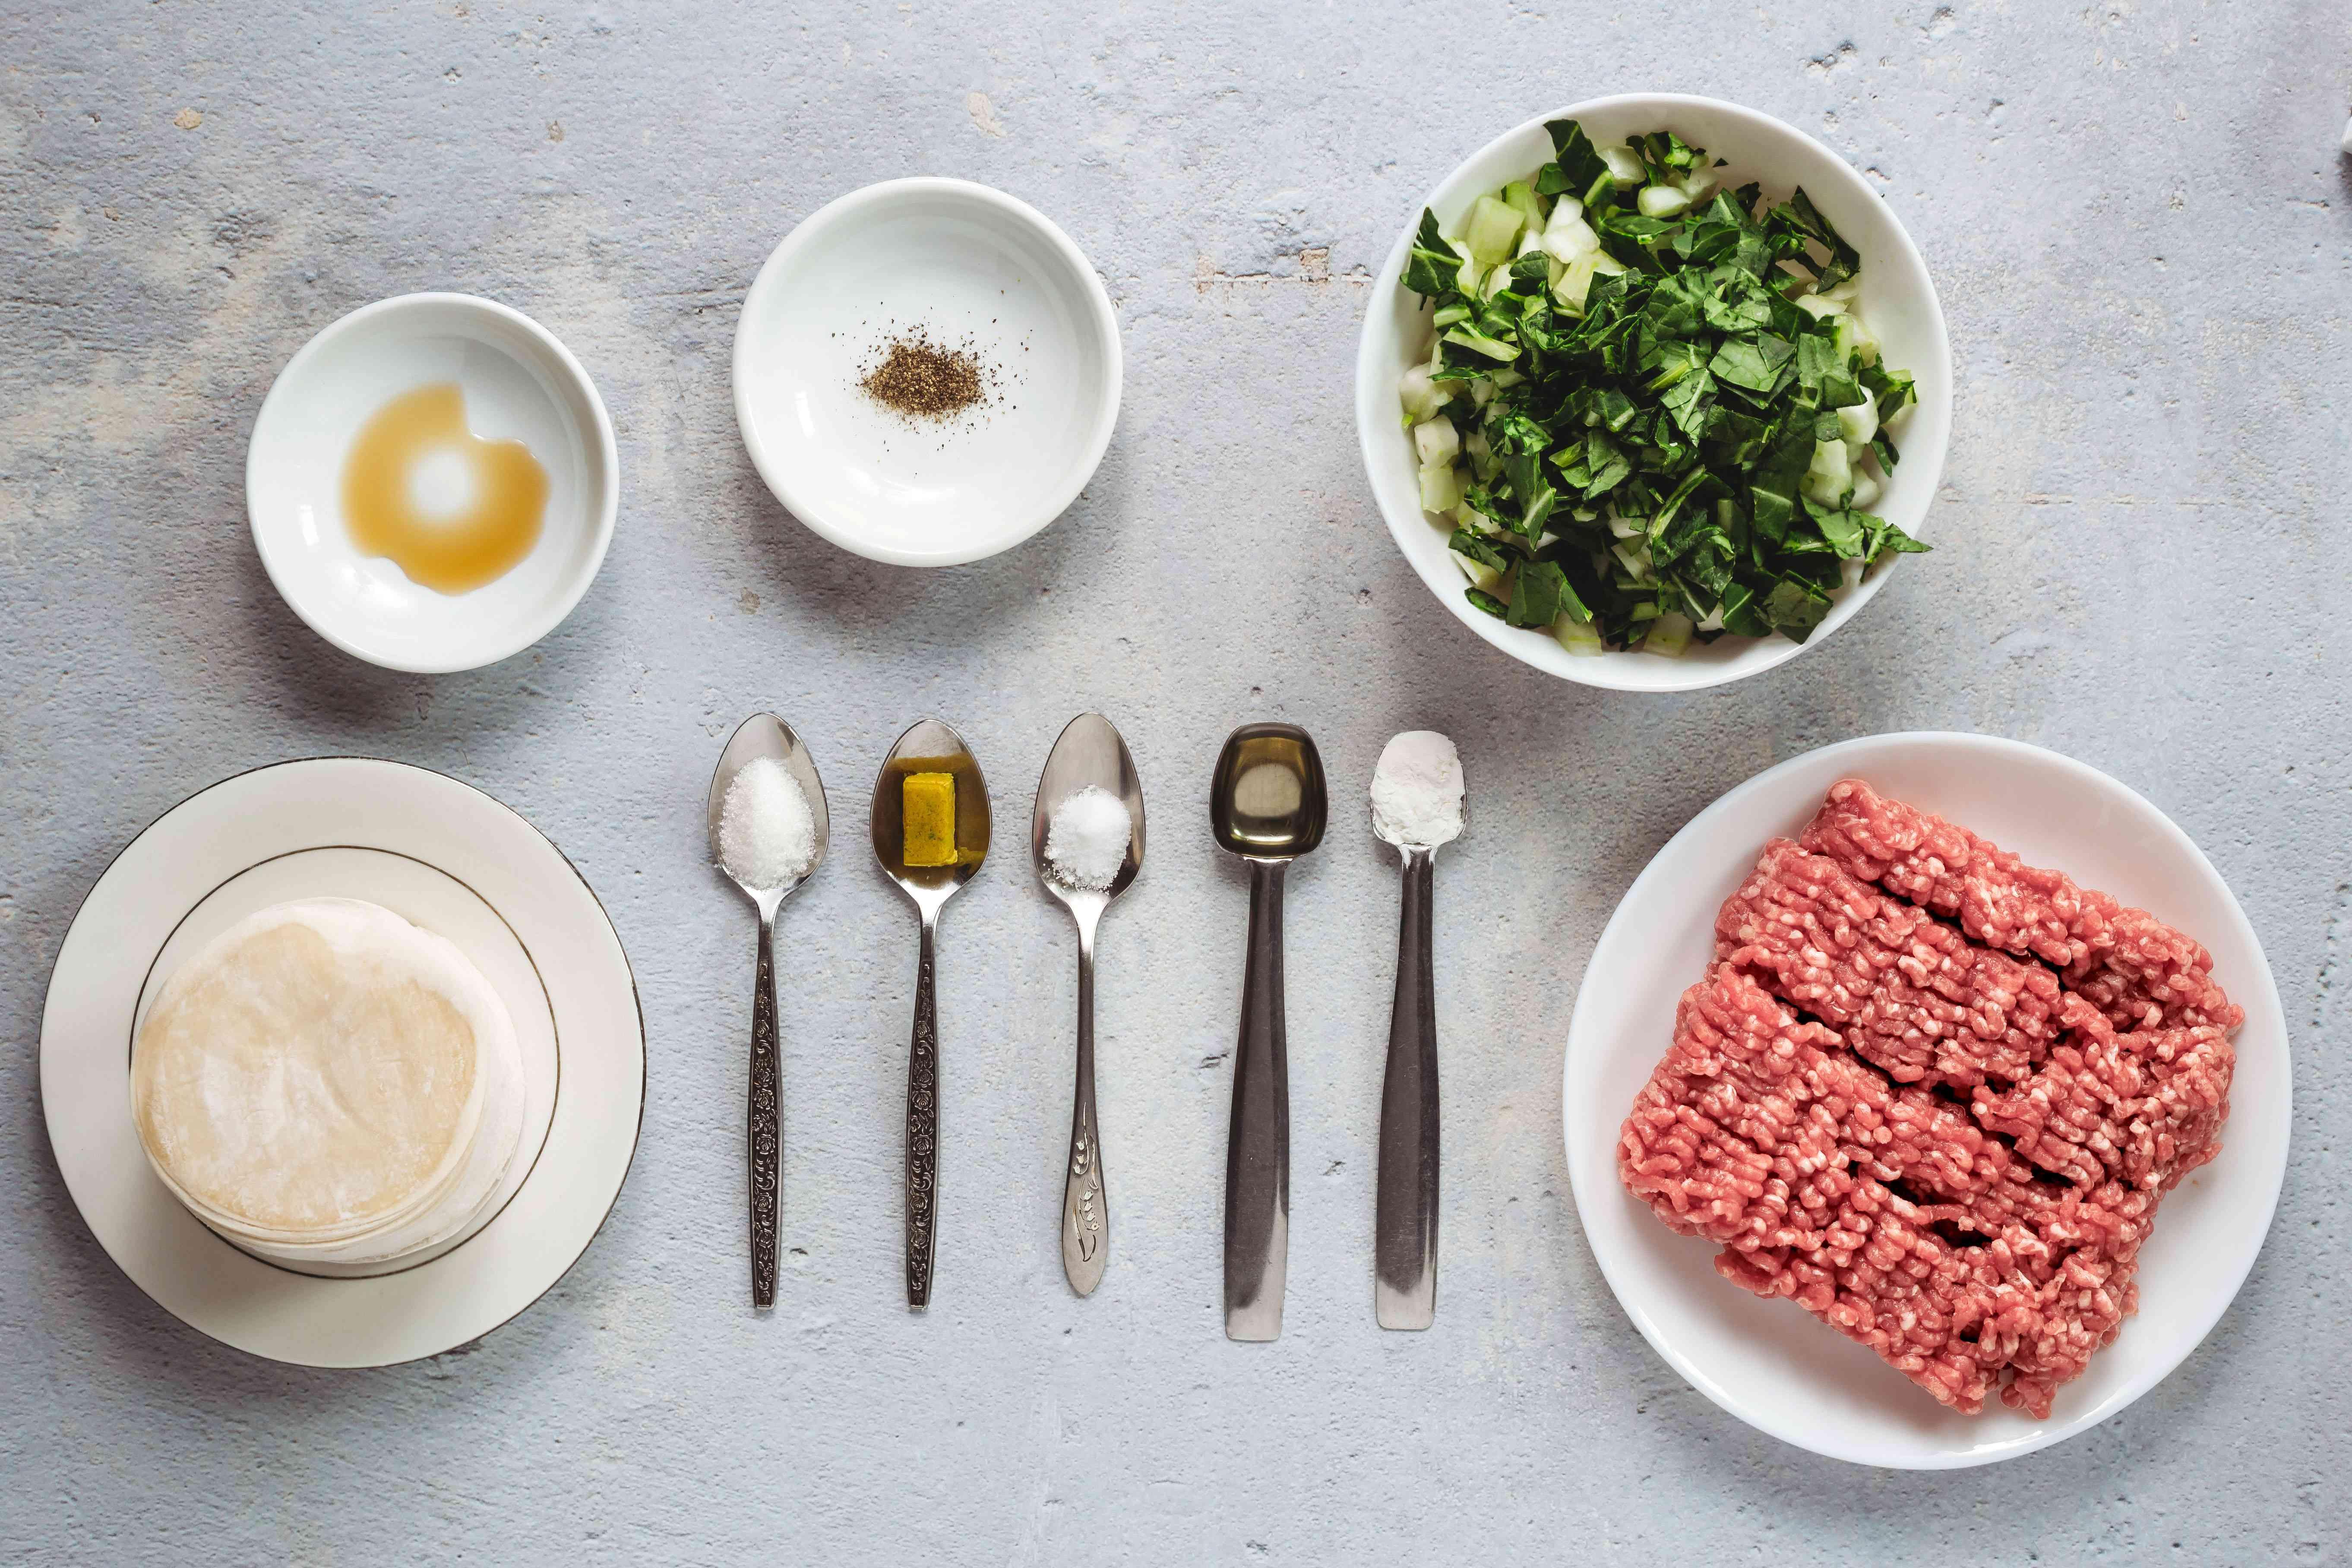 Ingredients to make potstickers